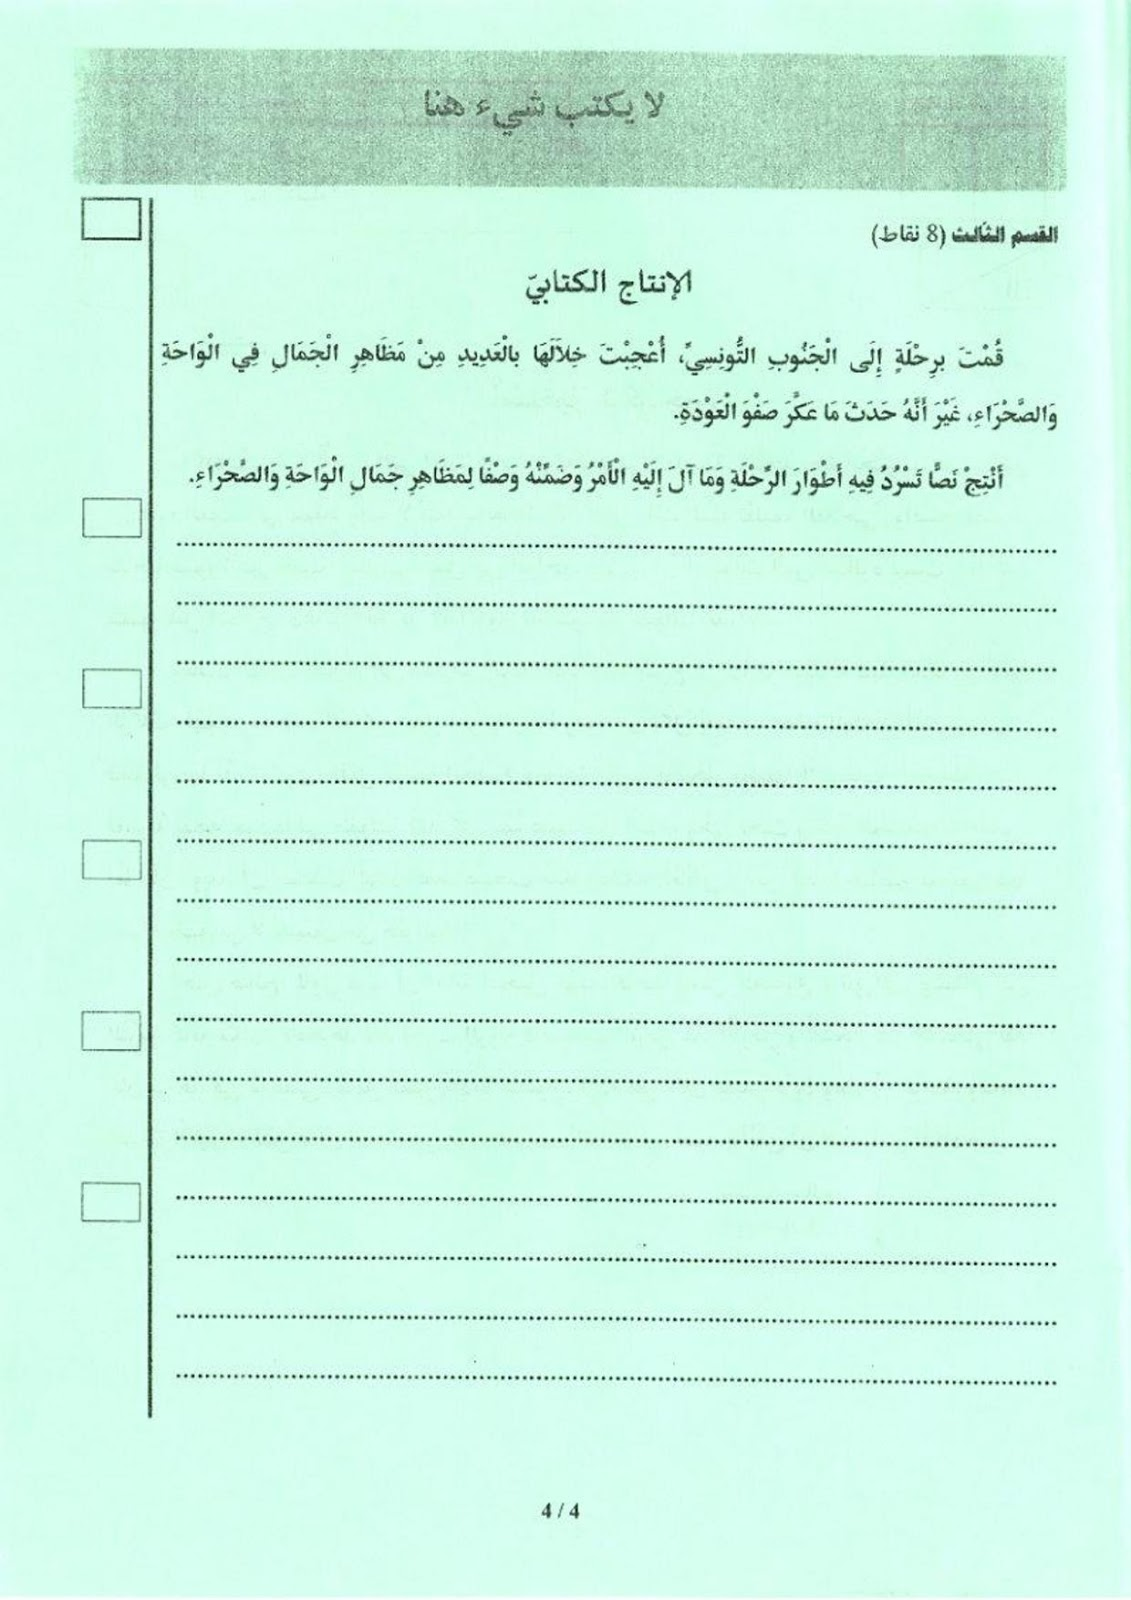 arabe page 004 - إختبارات اليوم الأول مع الإصلاح سيزيام 2018 عربية و انجليزية